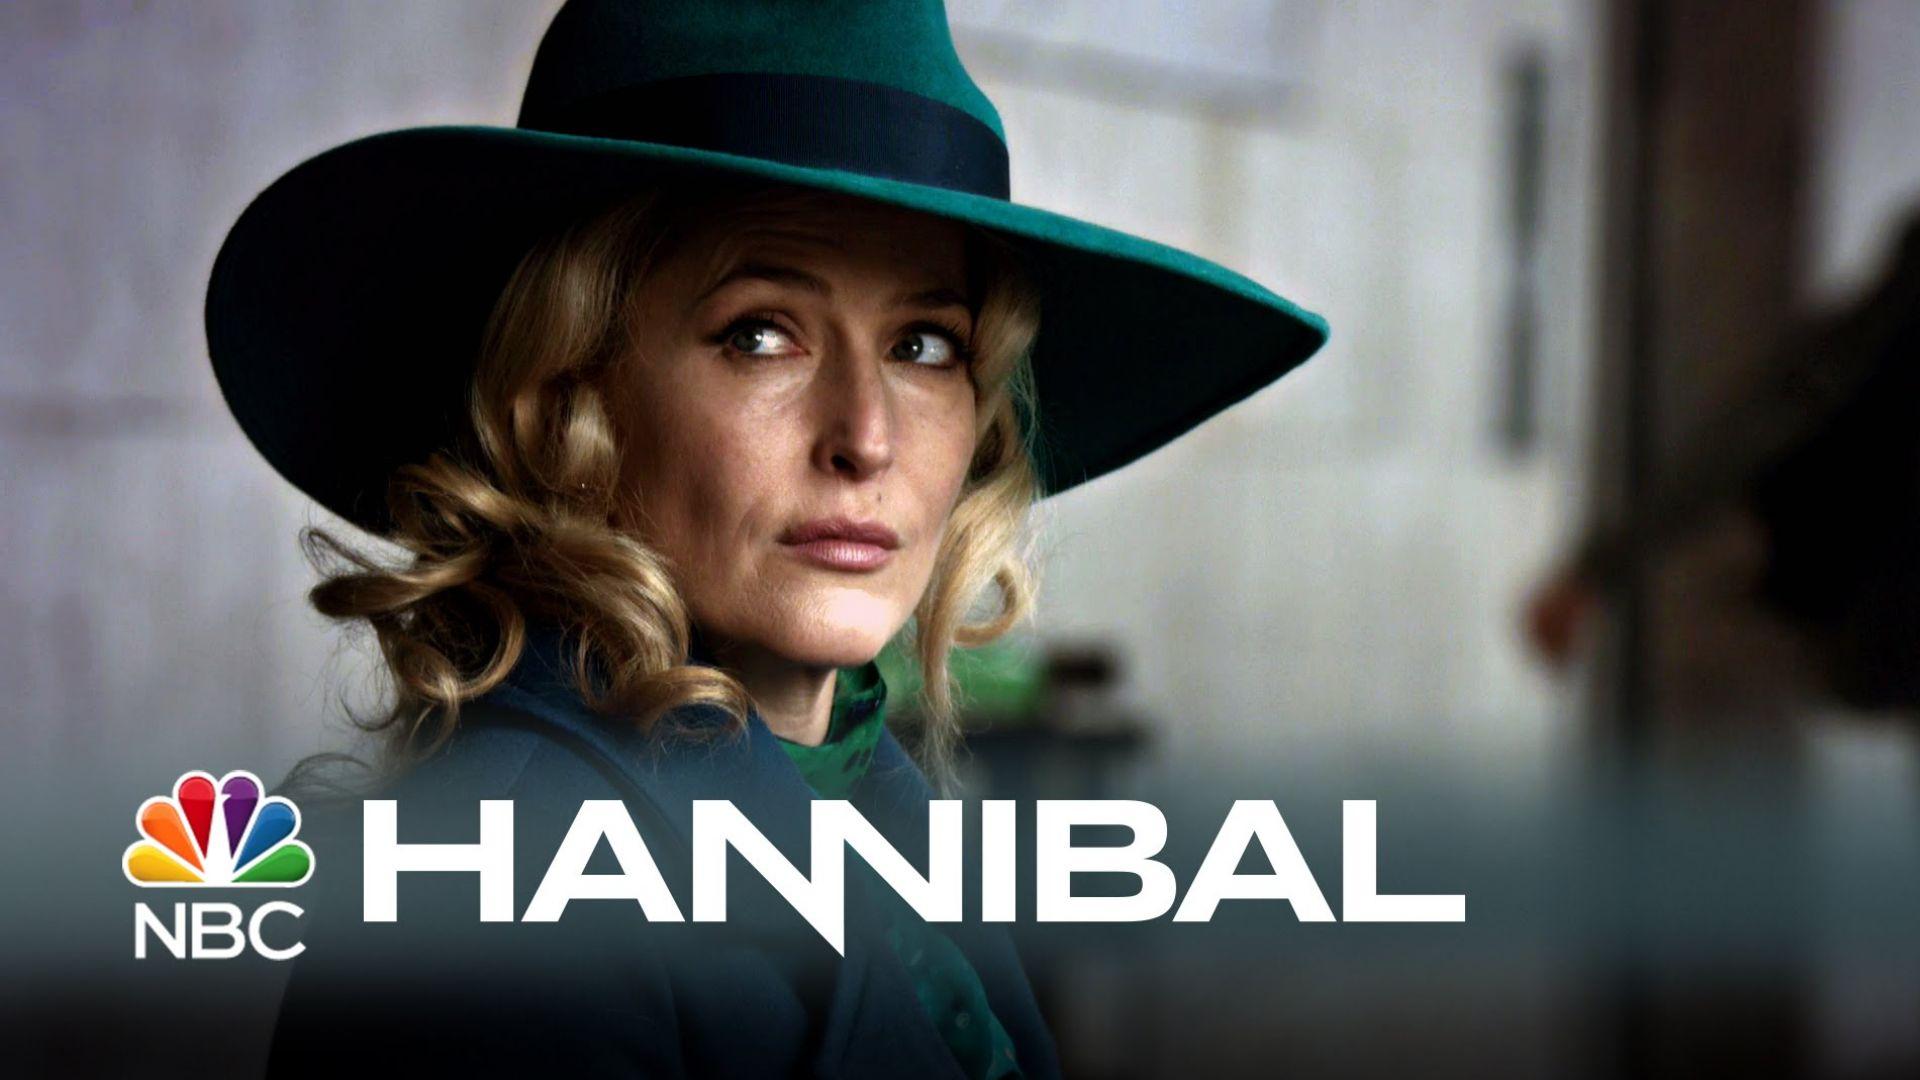 First Look at 'Hannibal' Season 3 Featuring Richard Armitage